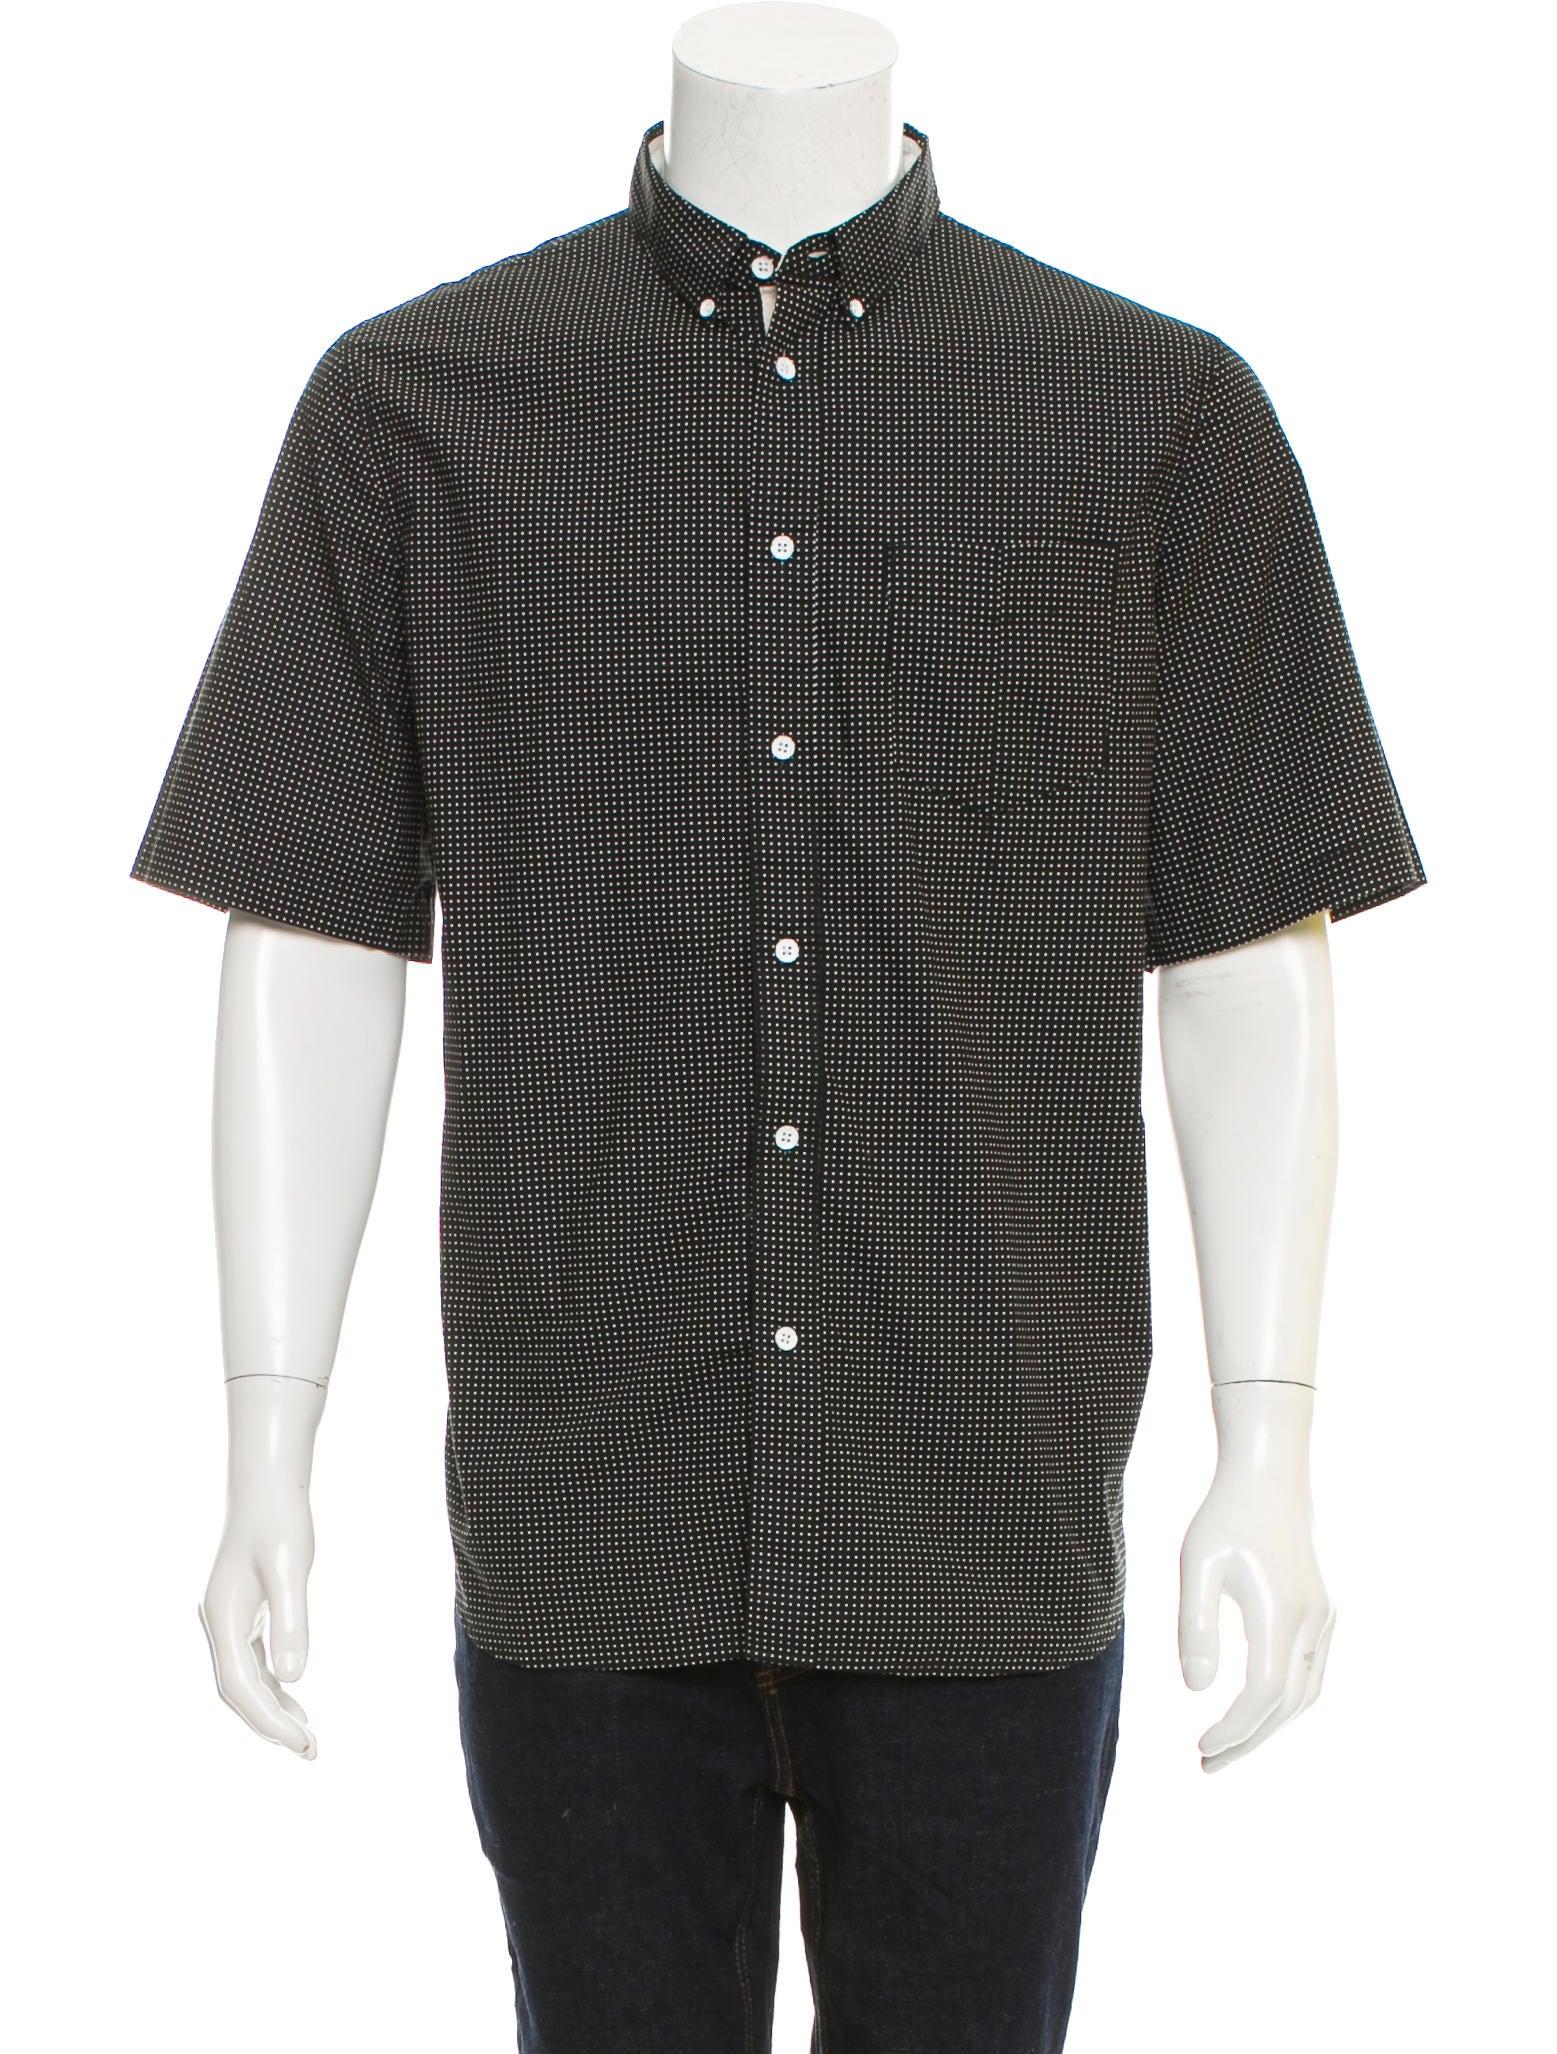 Rag bone polka dot button down shirt clothing for Button down polka dot shirt